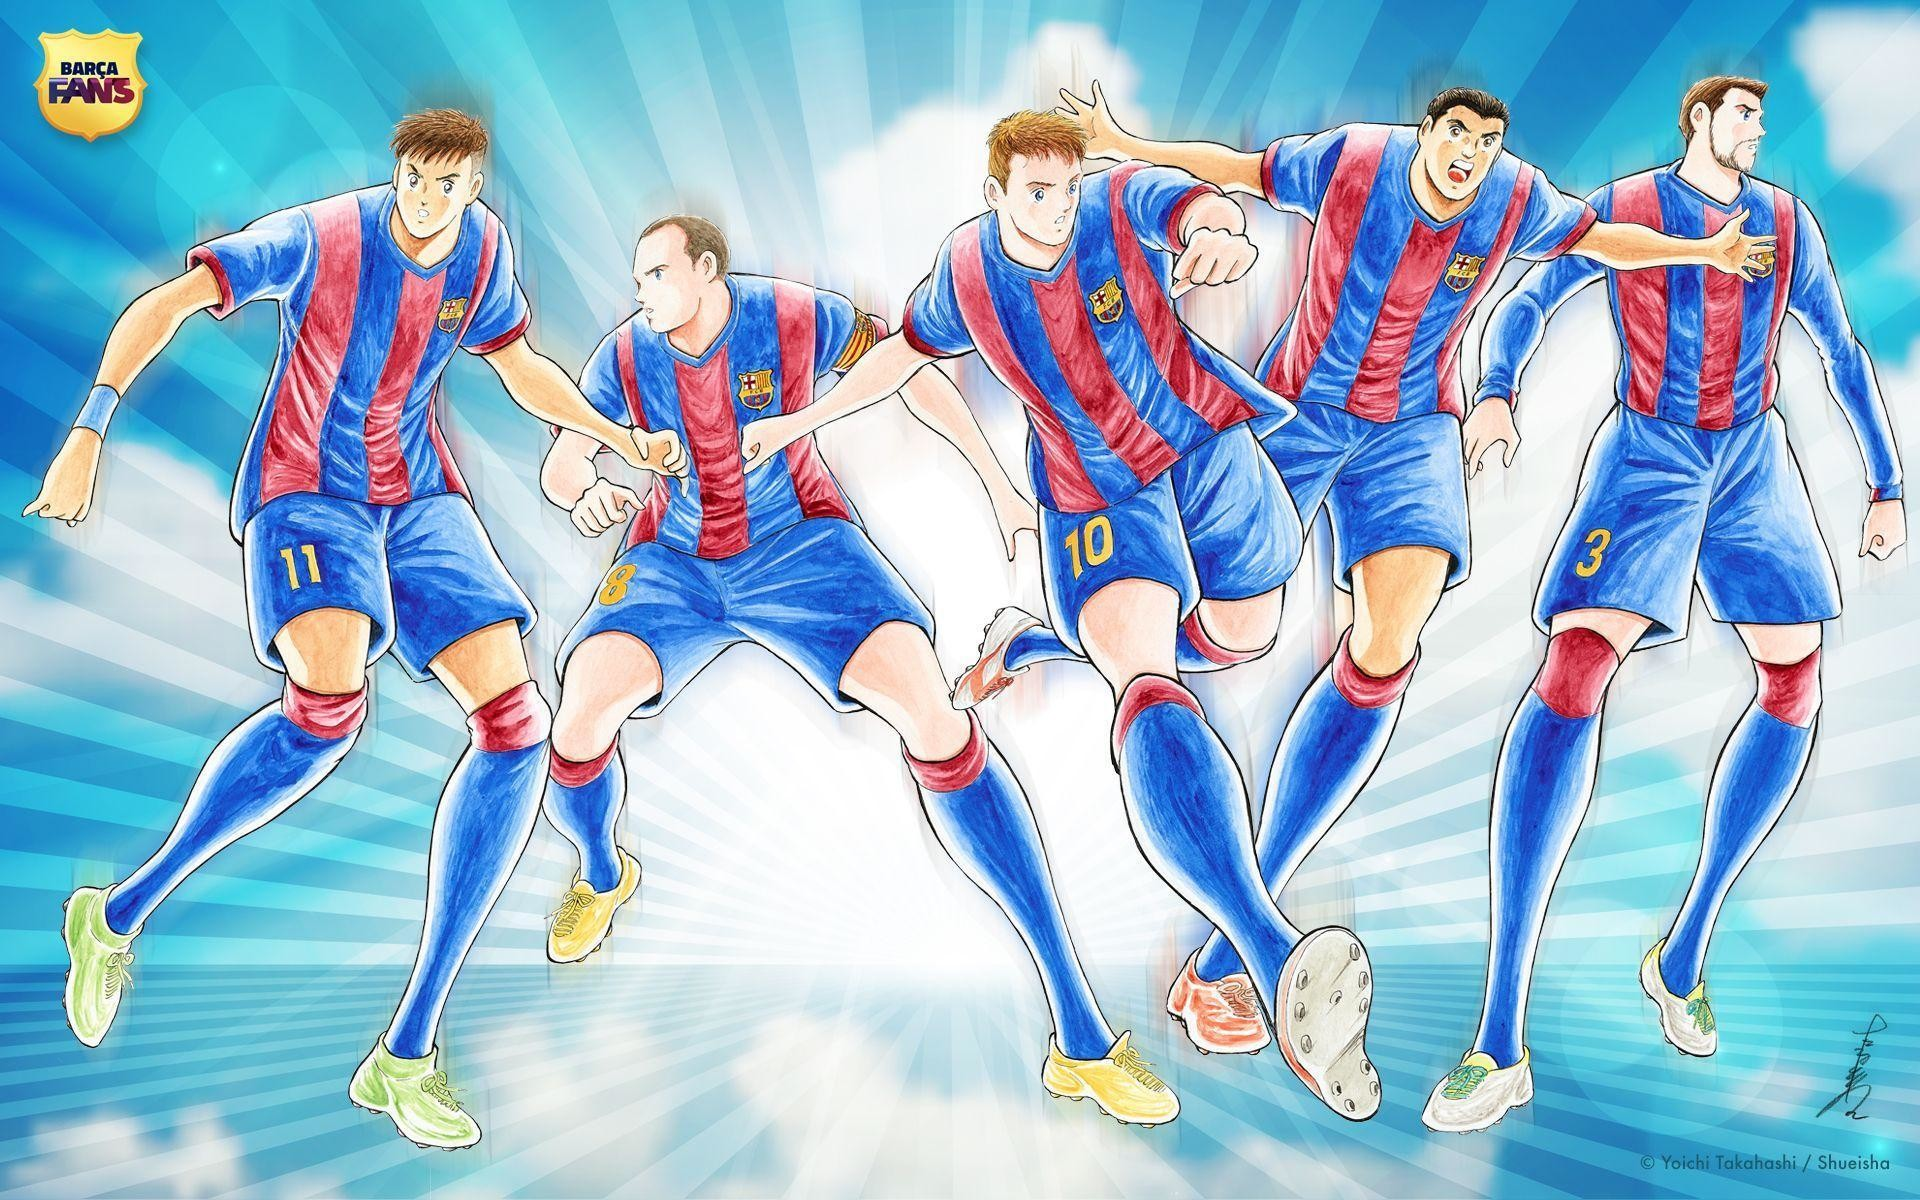 FC Barcelona Wallpaper By 'Captain Tsubasa' Artist Yoichi .